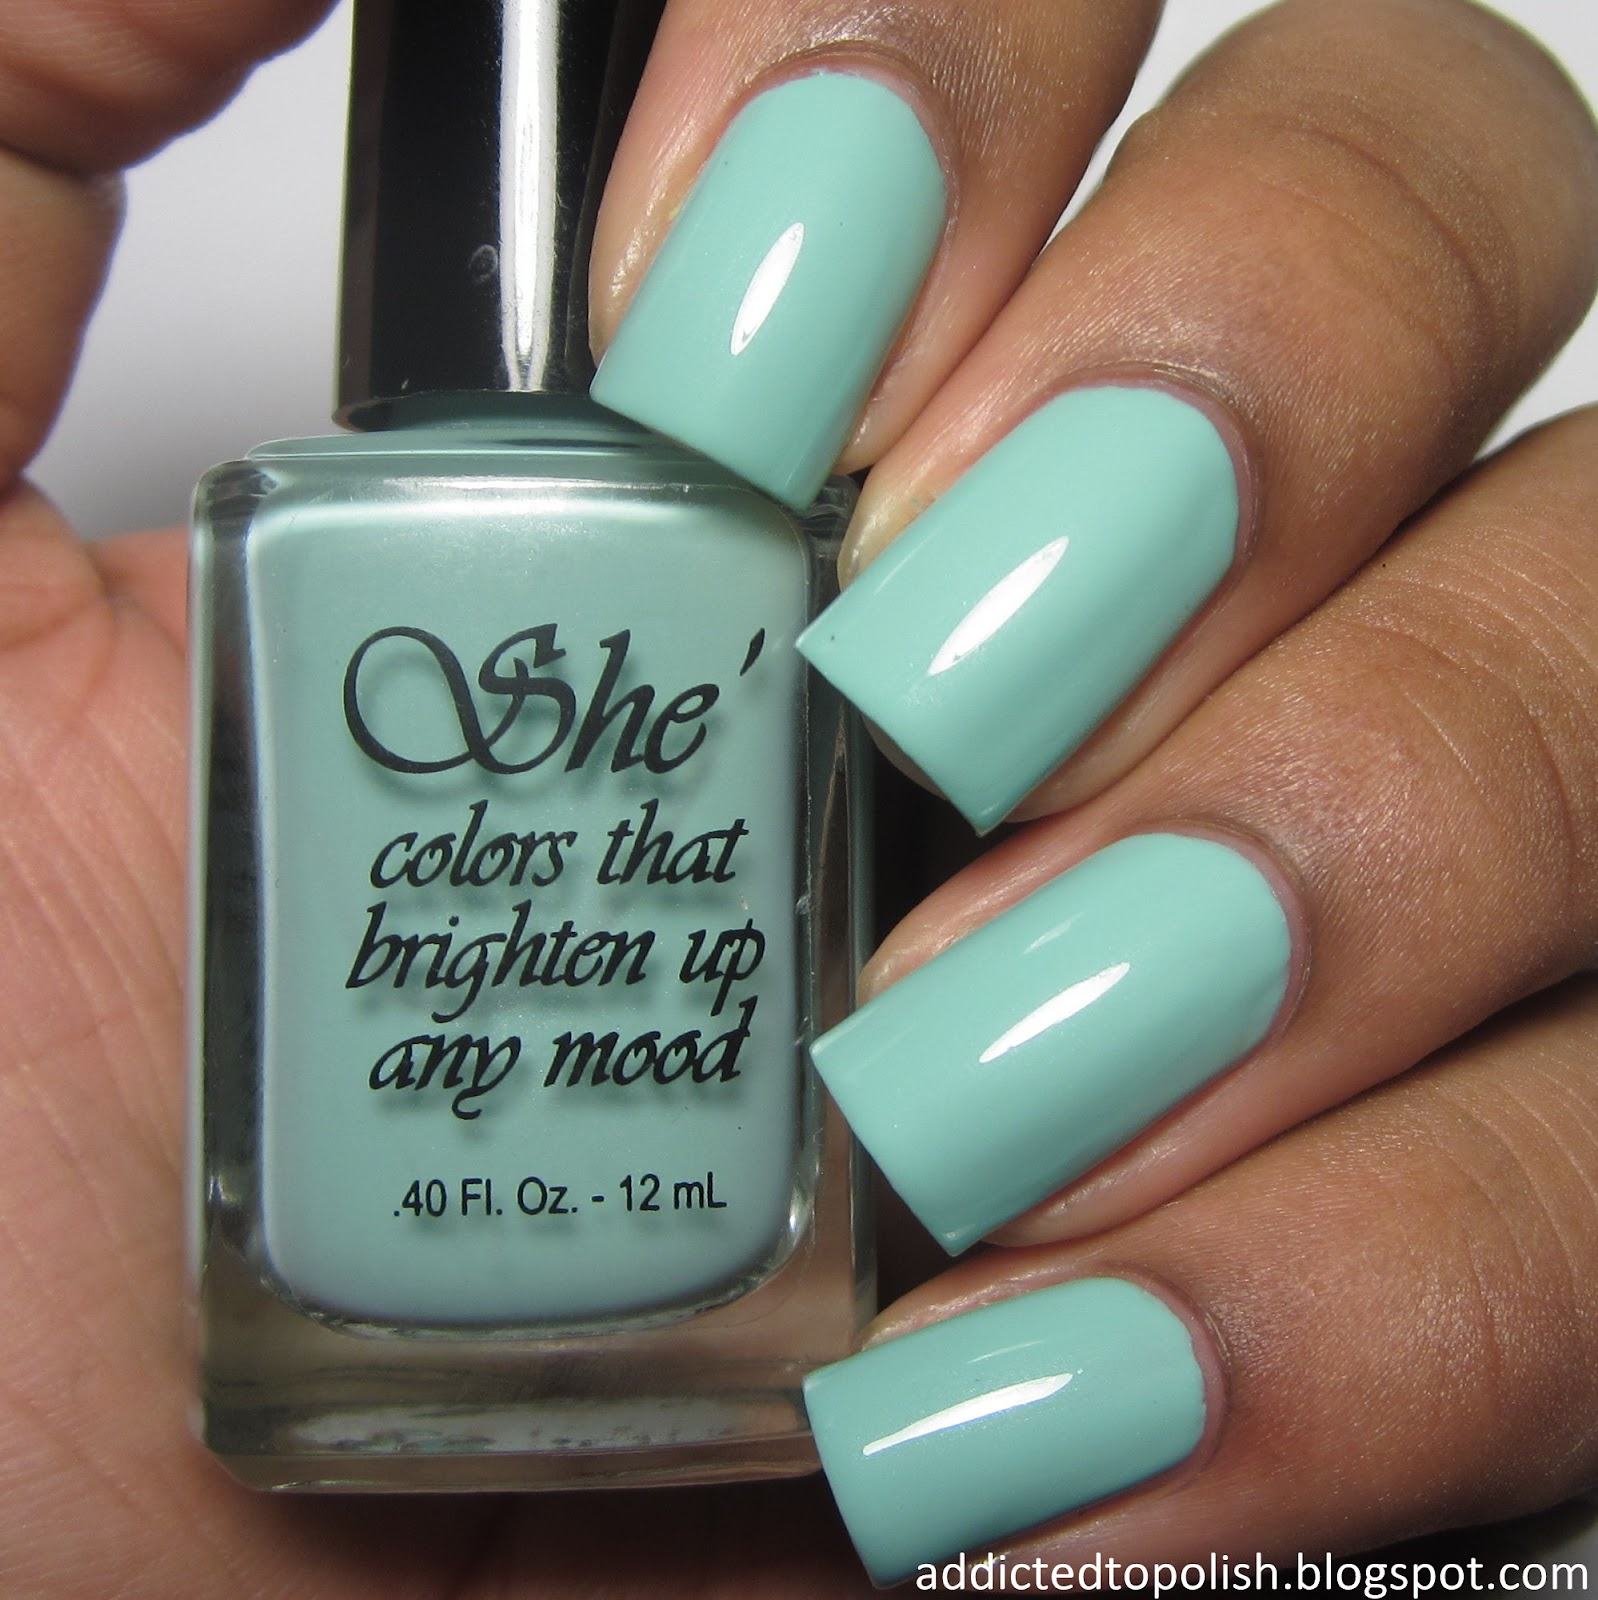 she nail polish oh tiff